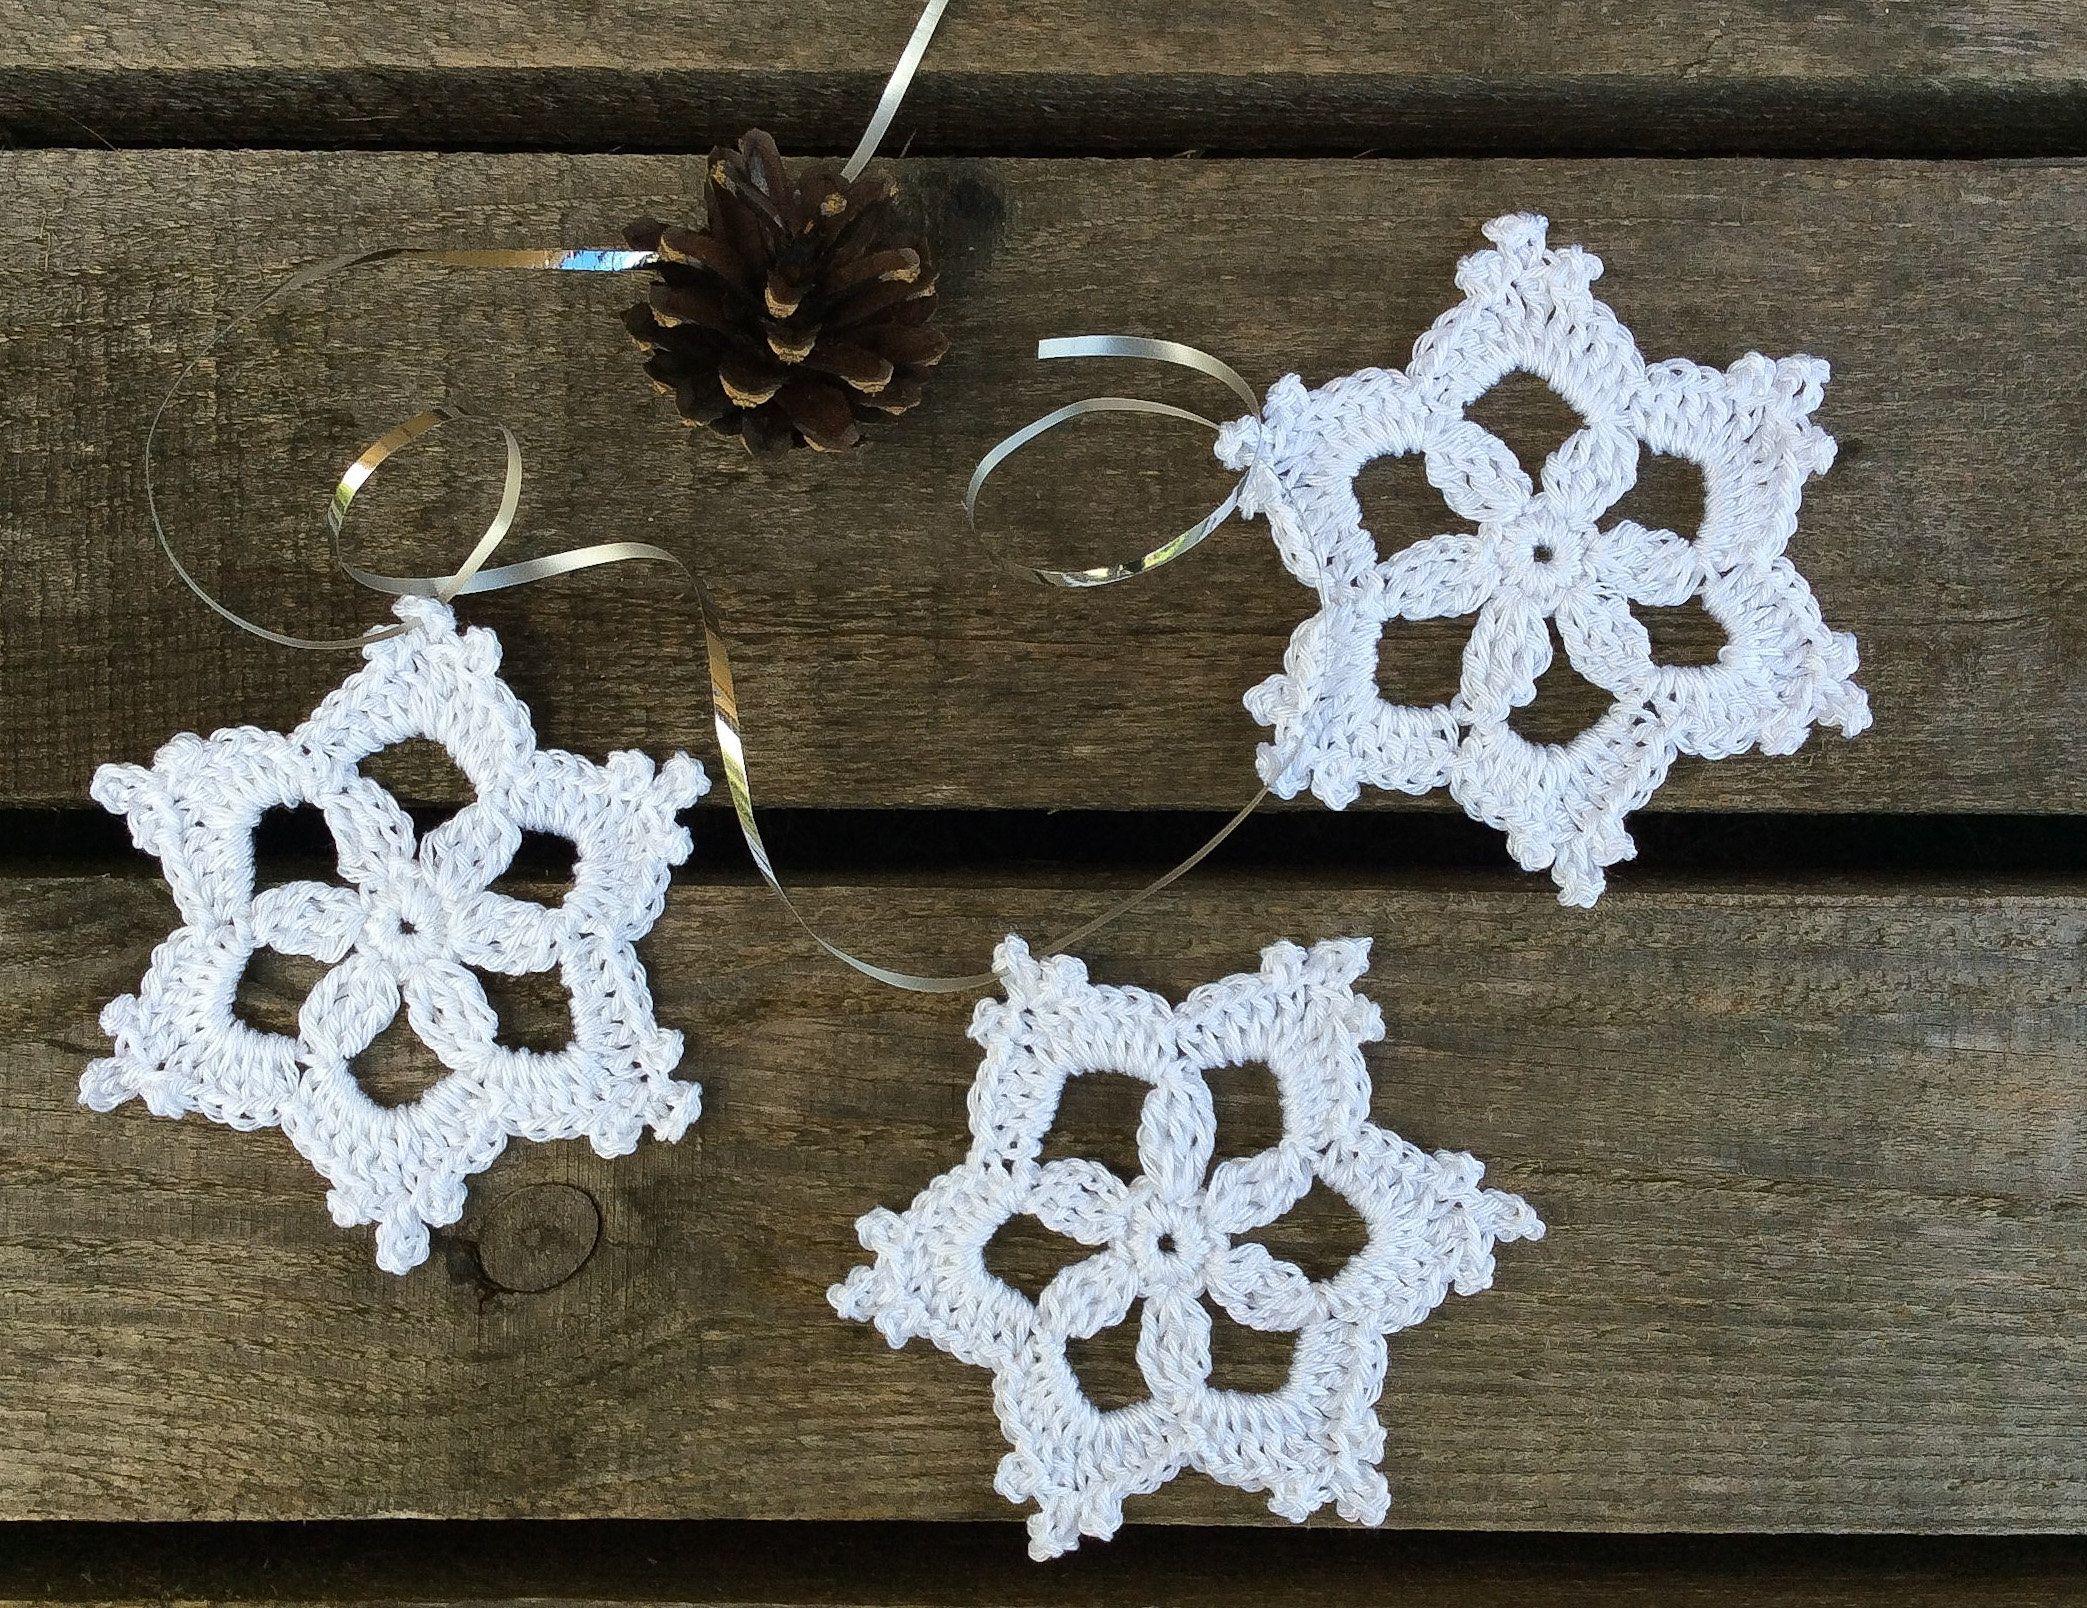 Crochet Pattern Dainty Snowflake Ornament Christmas Etsy In 2021 Crochet Christmas Snowflakes Crochet Flowers Easy Free Crochet Snowflake Patterns